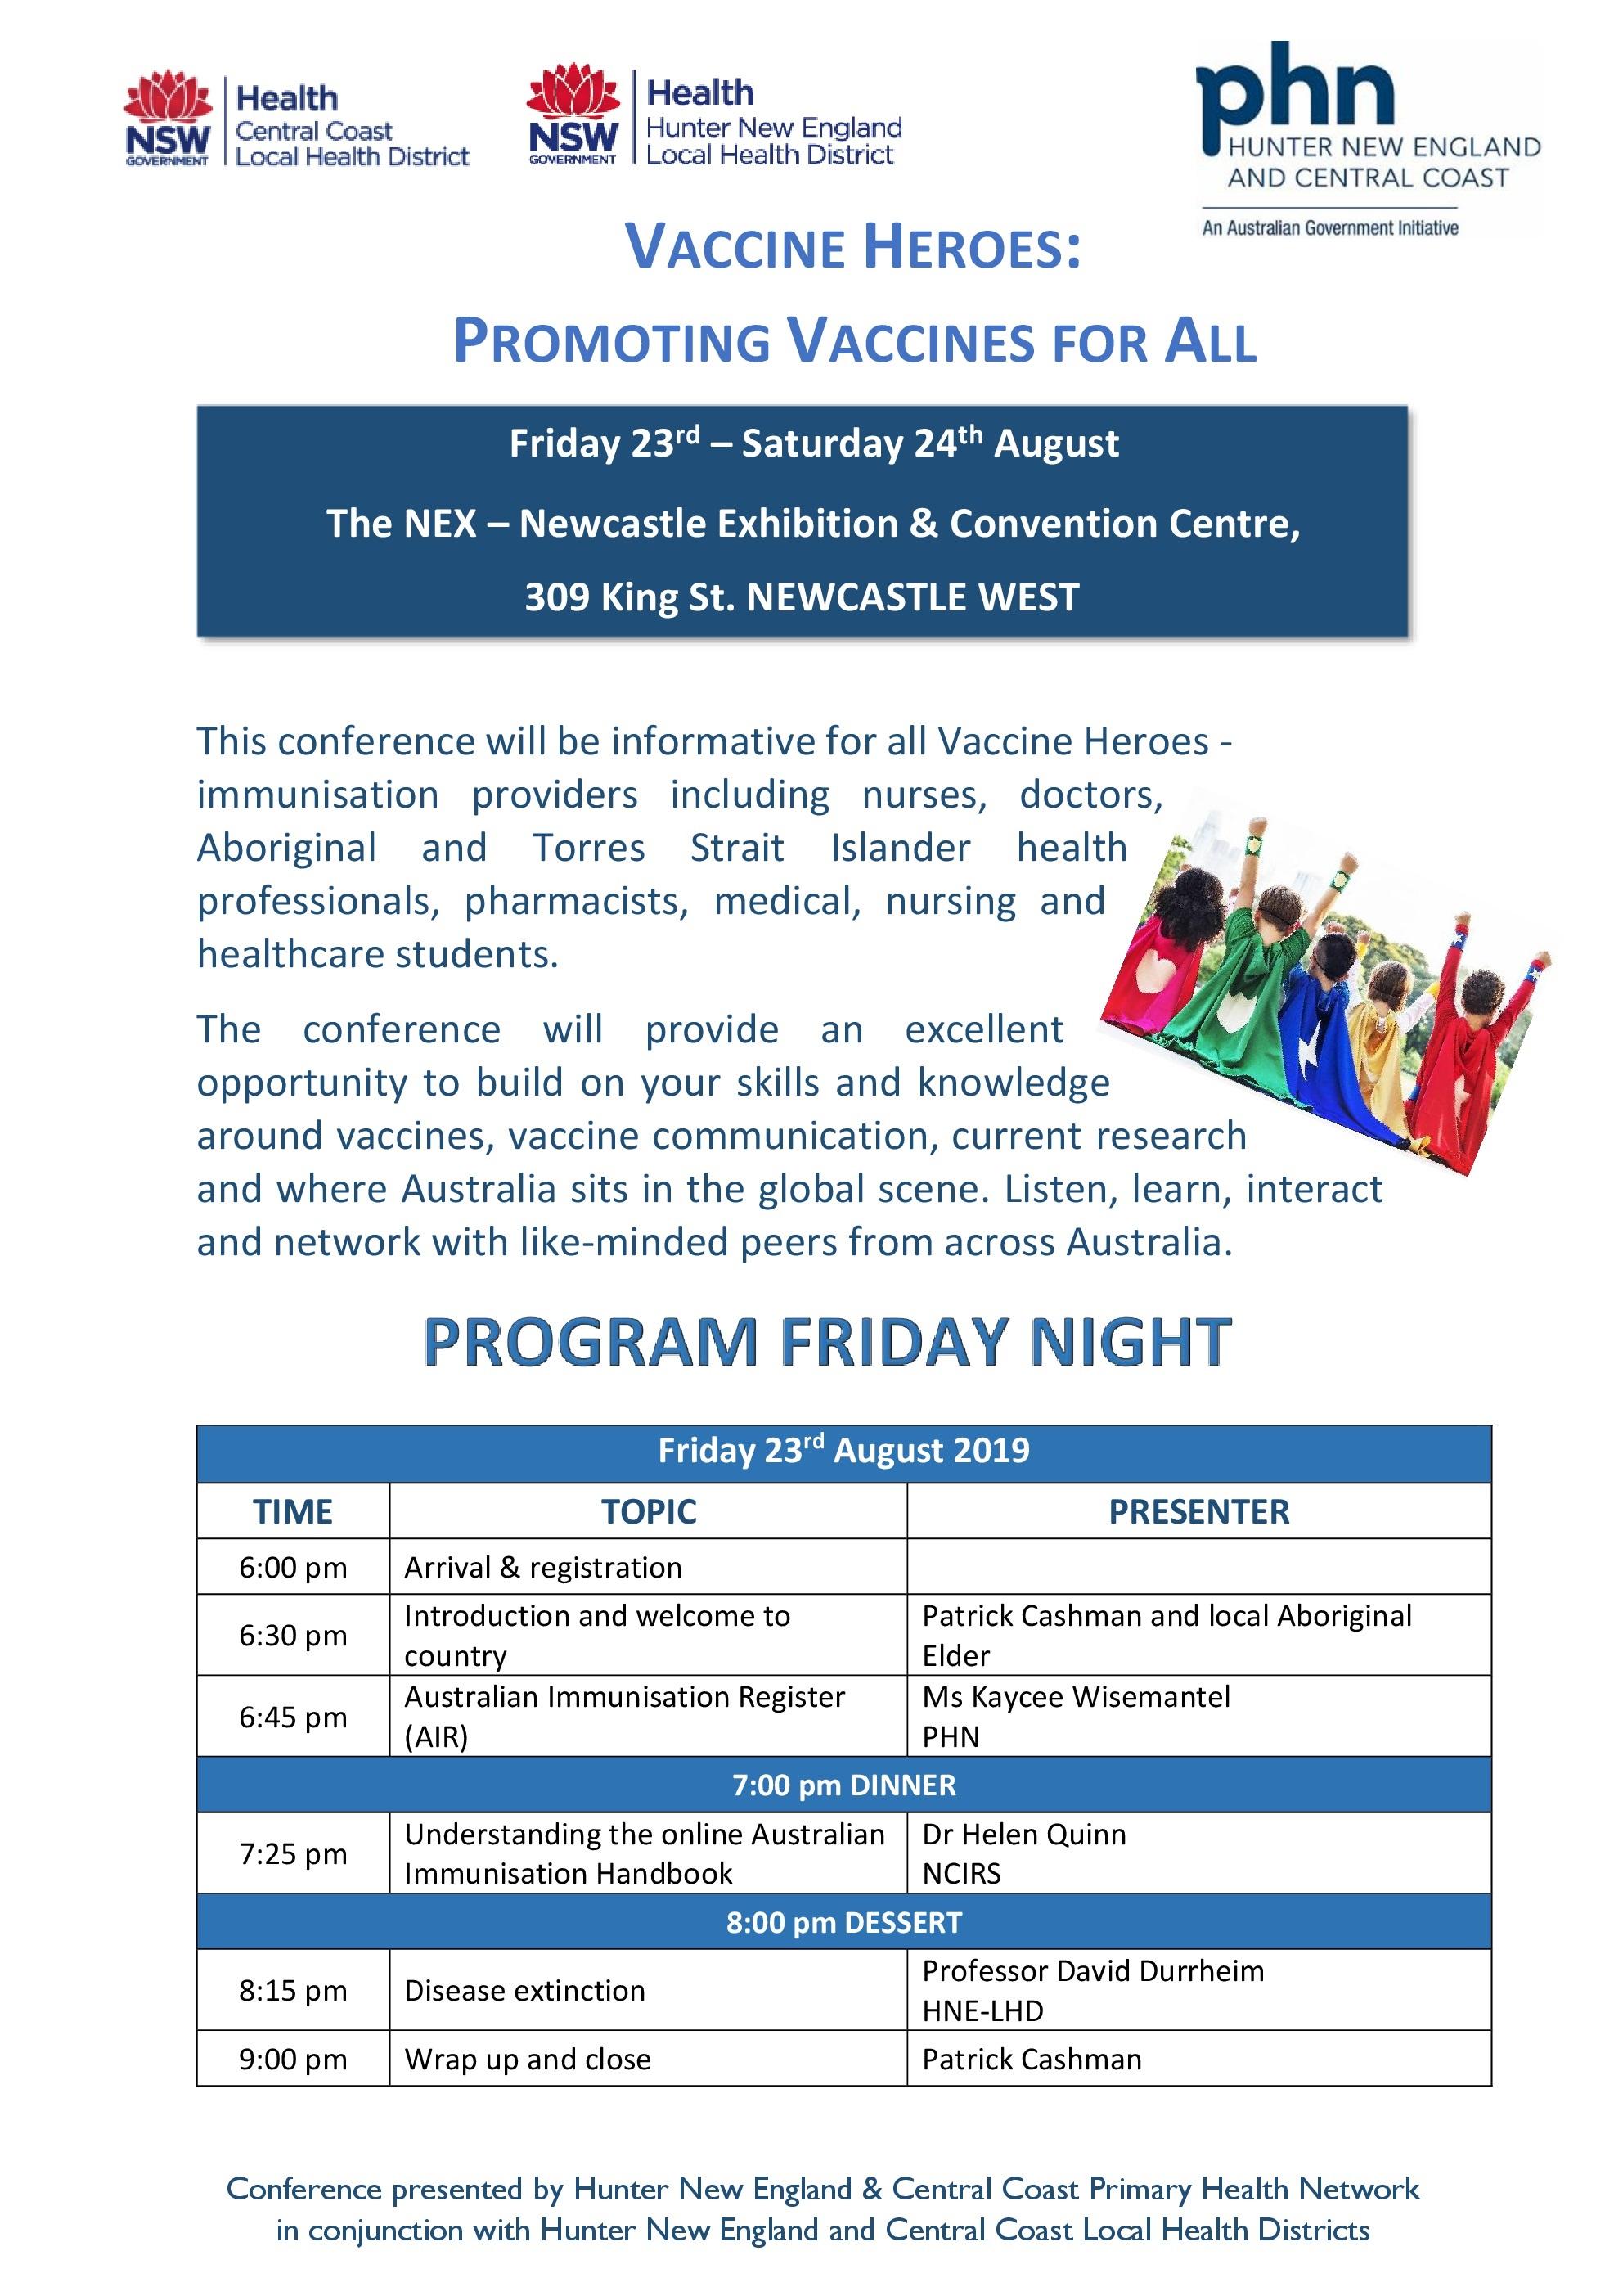 Program Friday 23rd August 2019